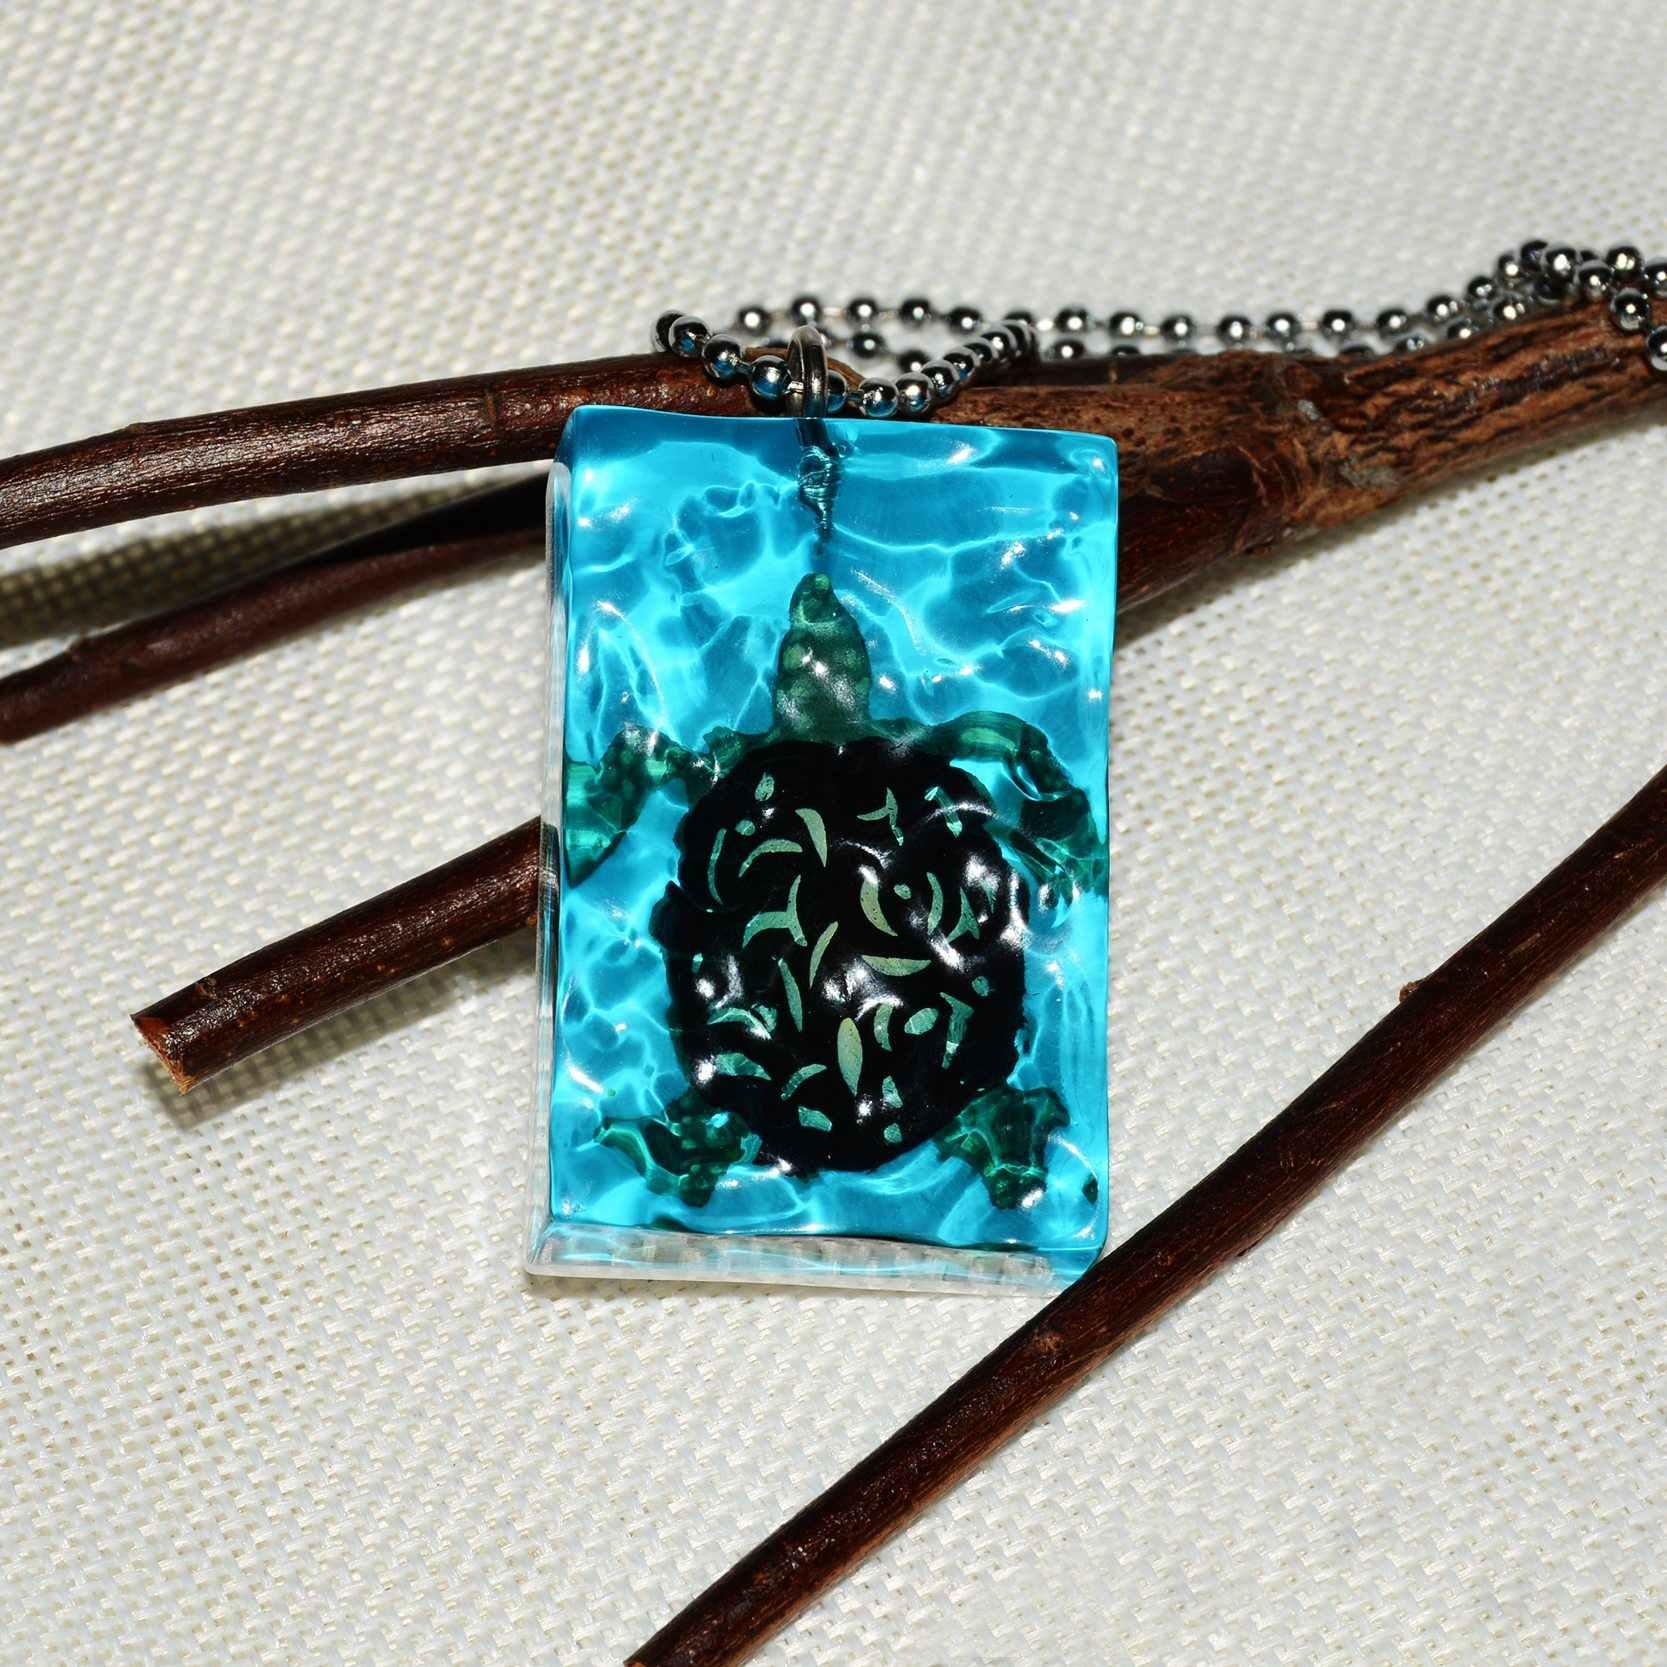 Sea DIY Handmade Jewelry Ocean Turtle Geometric Rectangular Resin Pendant Stainless Steel Chain Beads Necklace Men Women Gifts